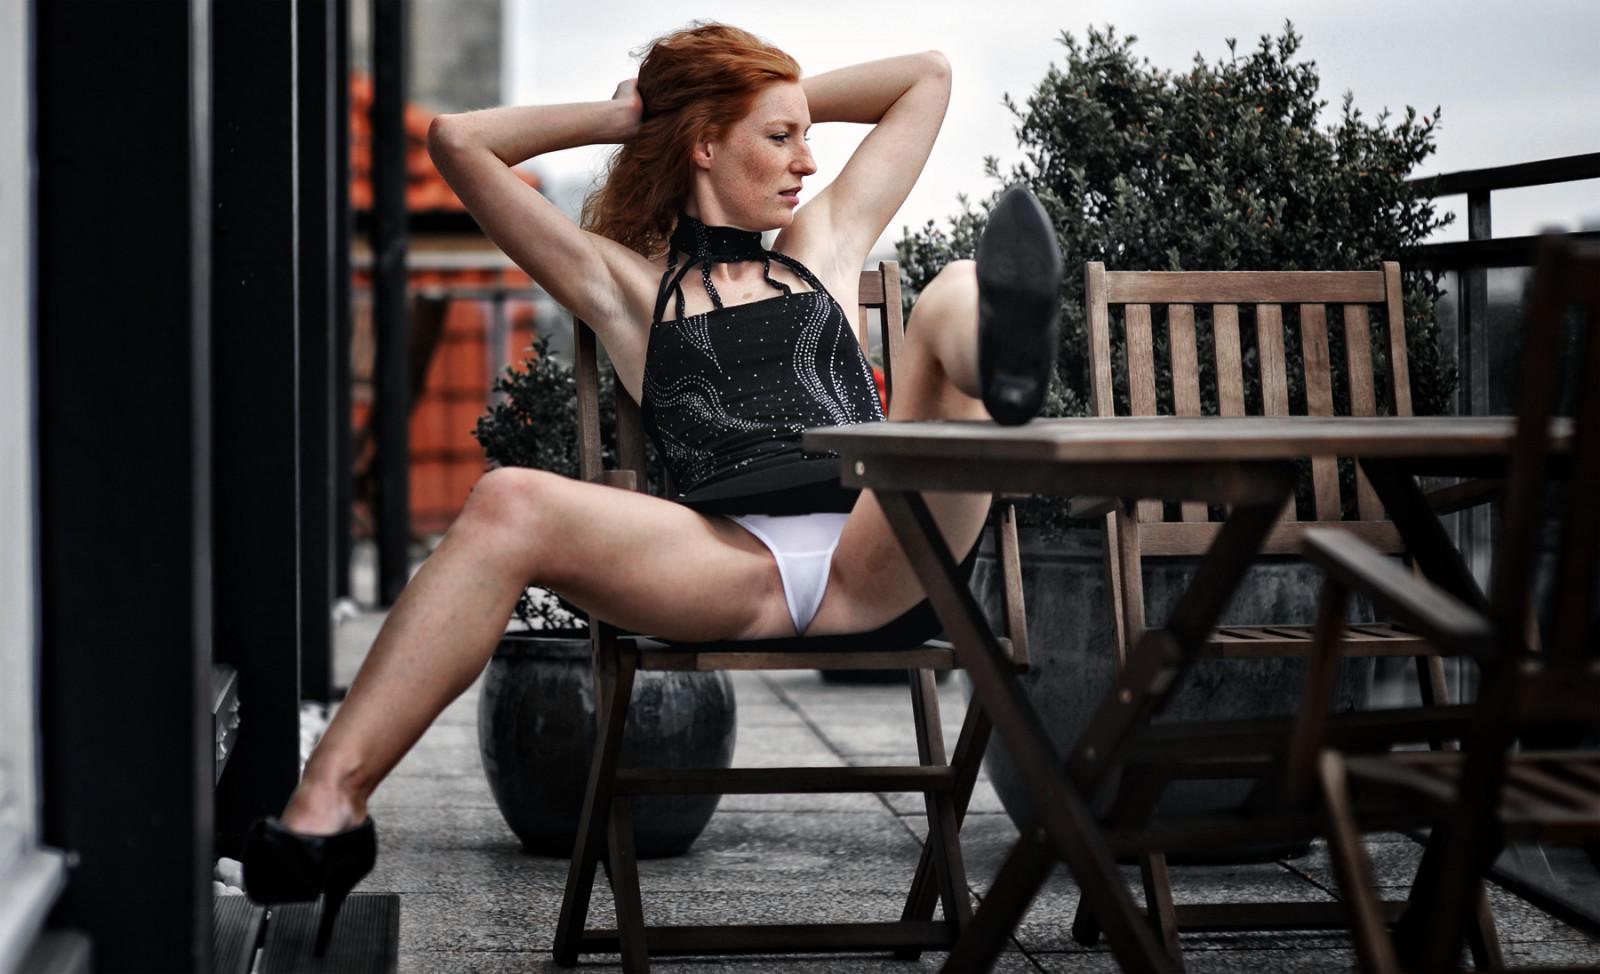 Really really upskirt miniskirt thong string short panty hot